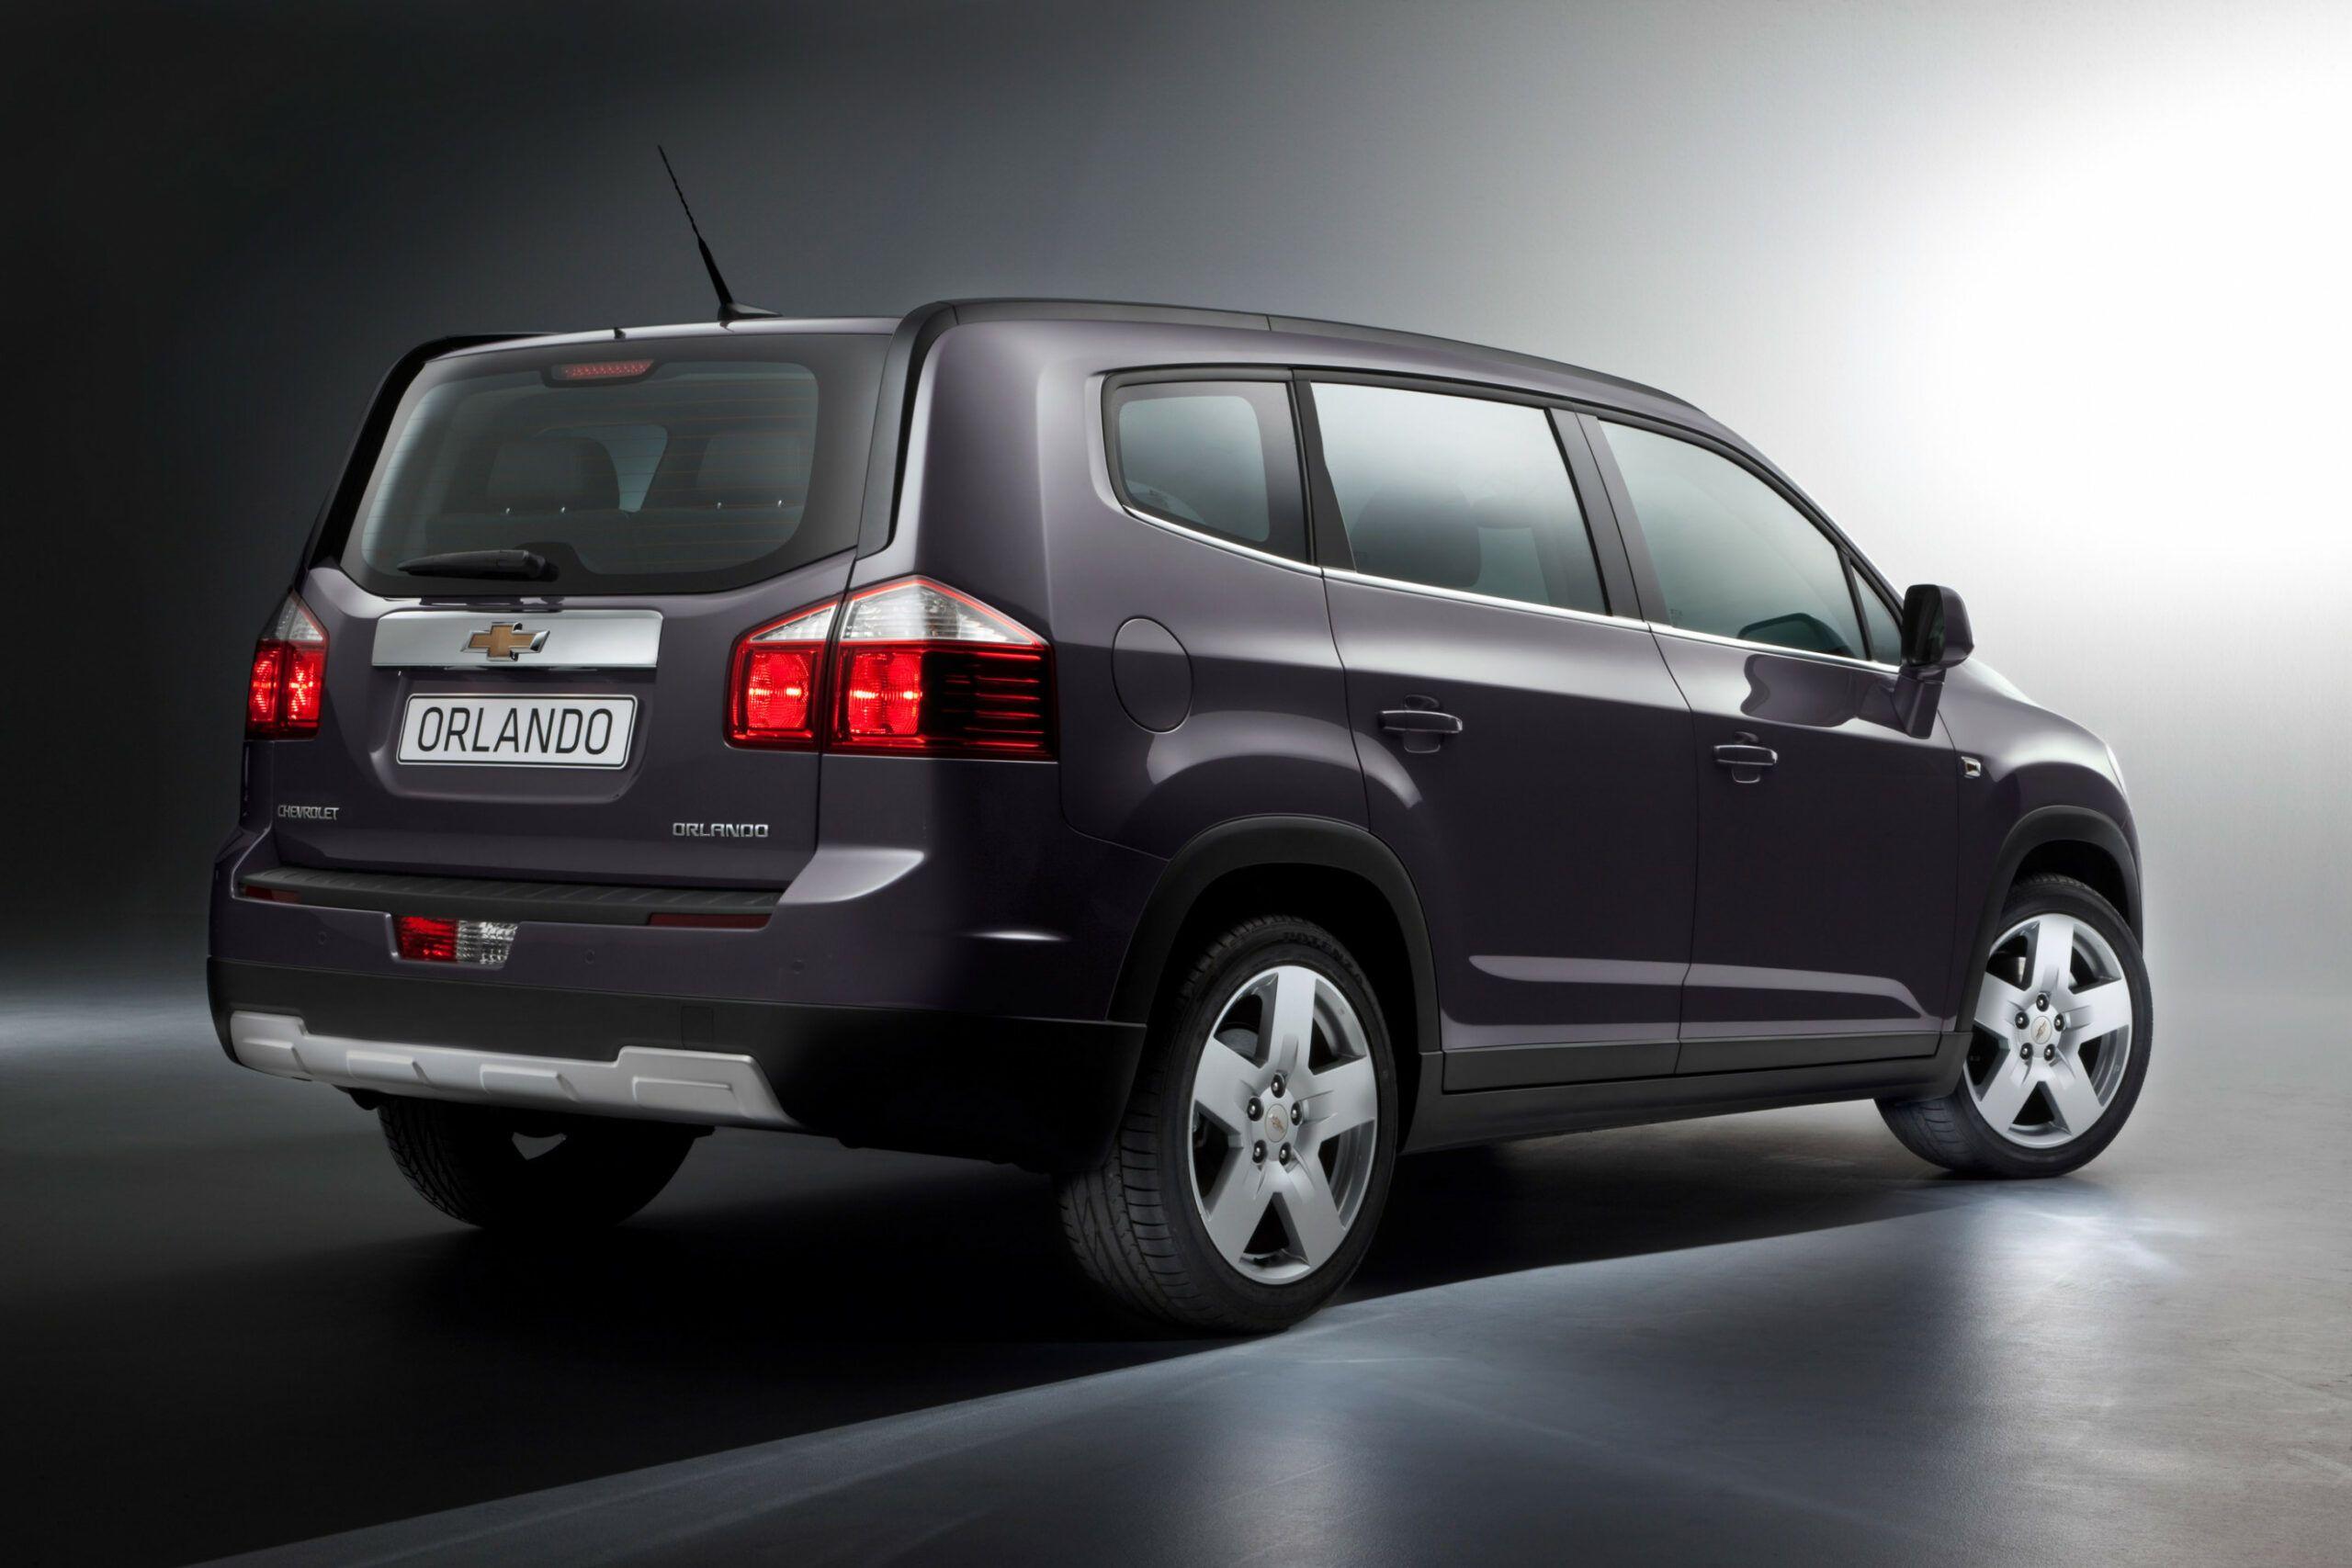 2021 Chevrolet 2500 Release Date Chevrolet Orlando Chevy